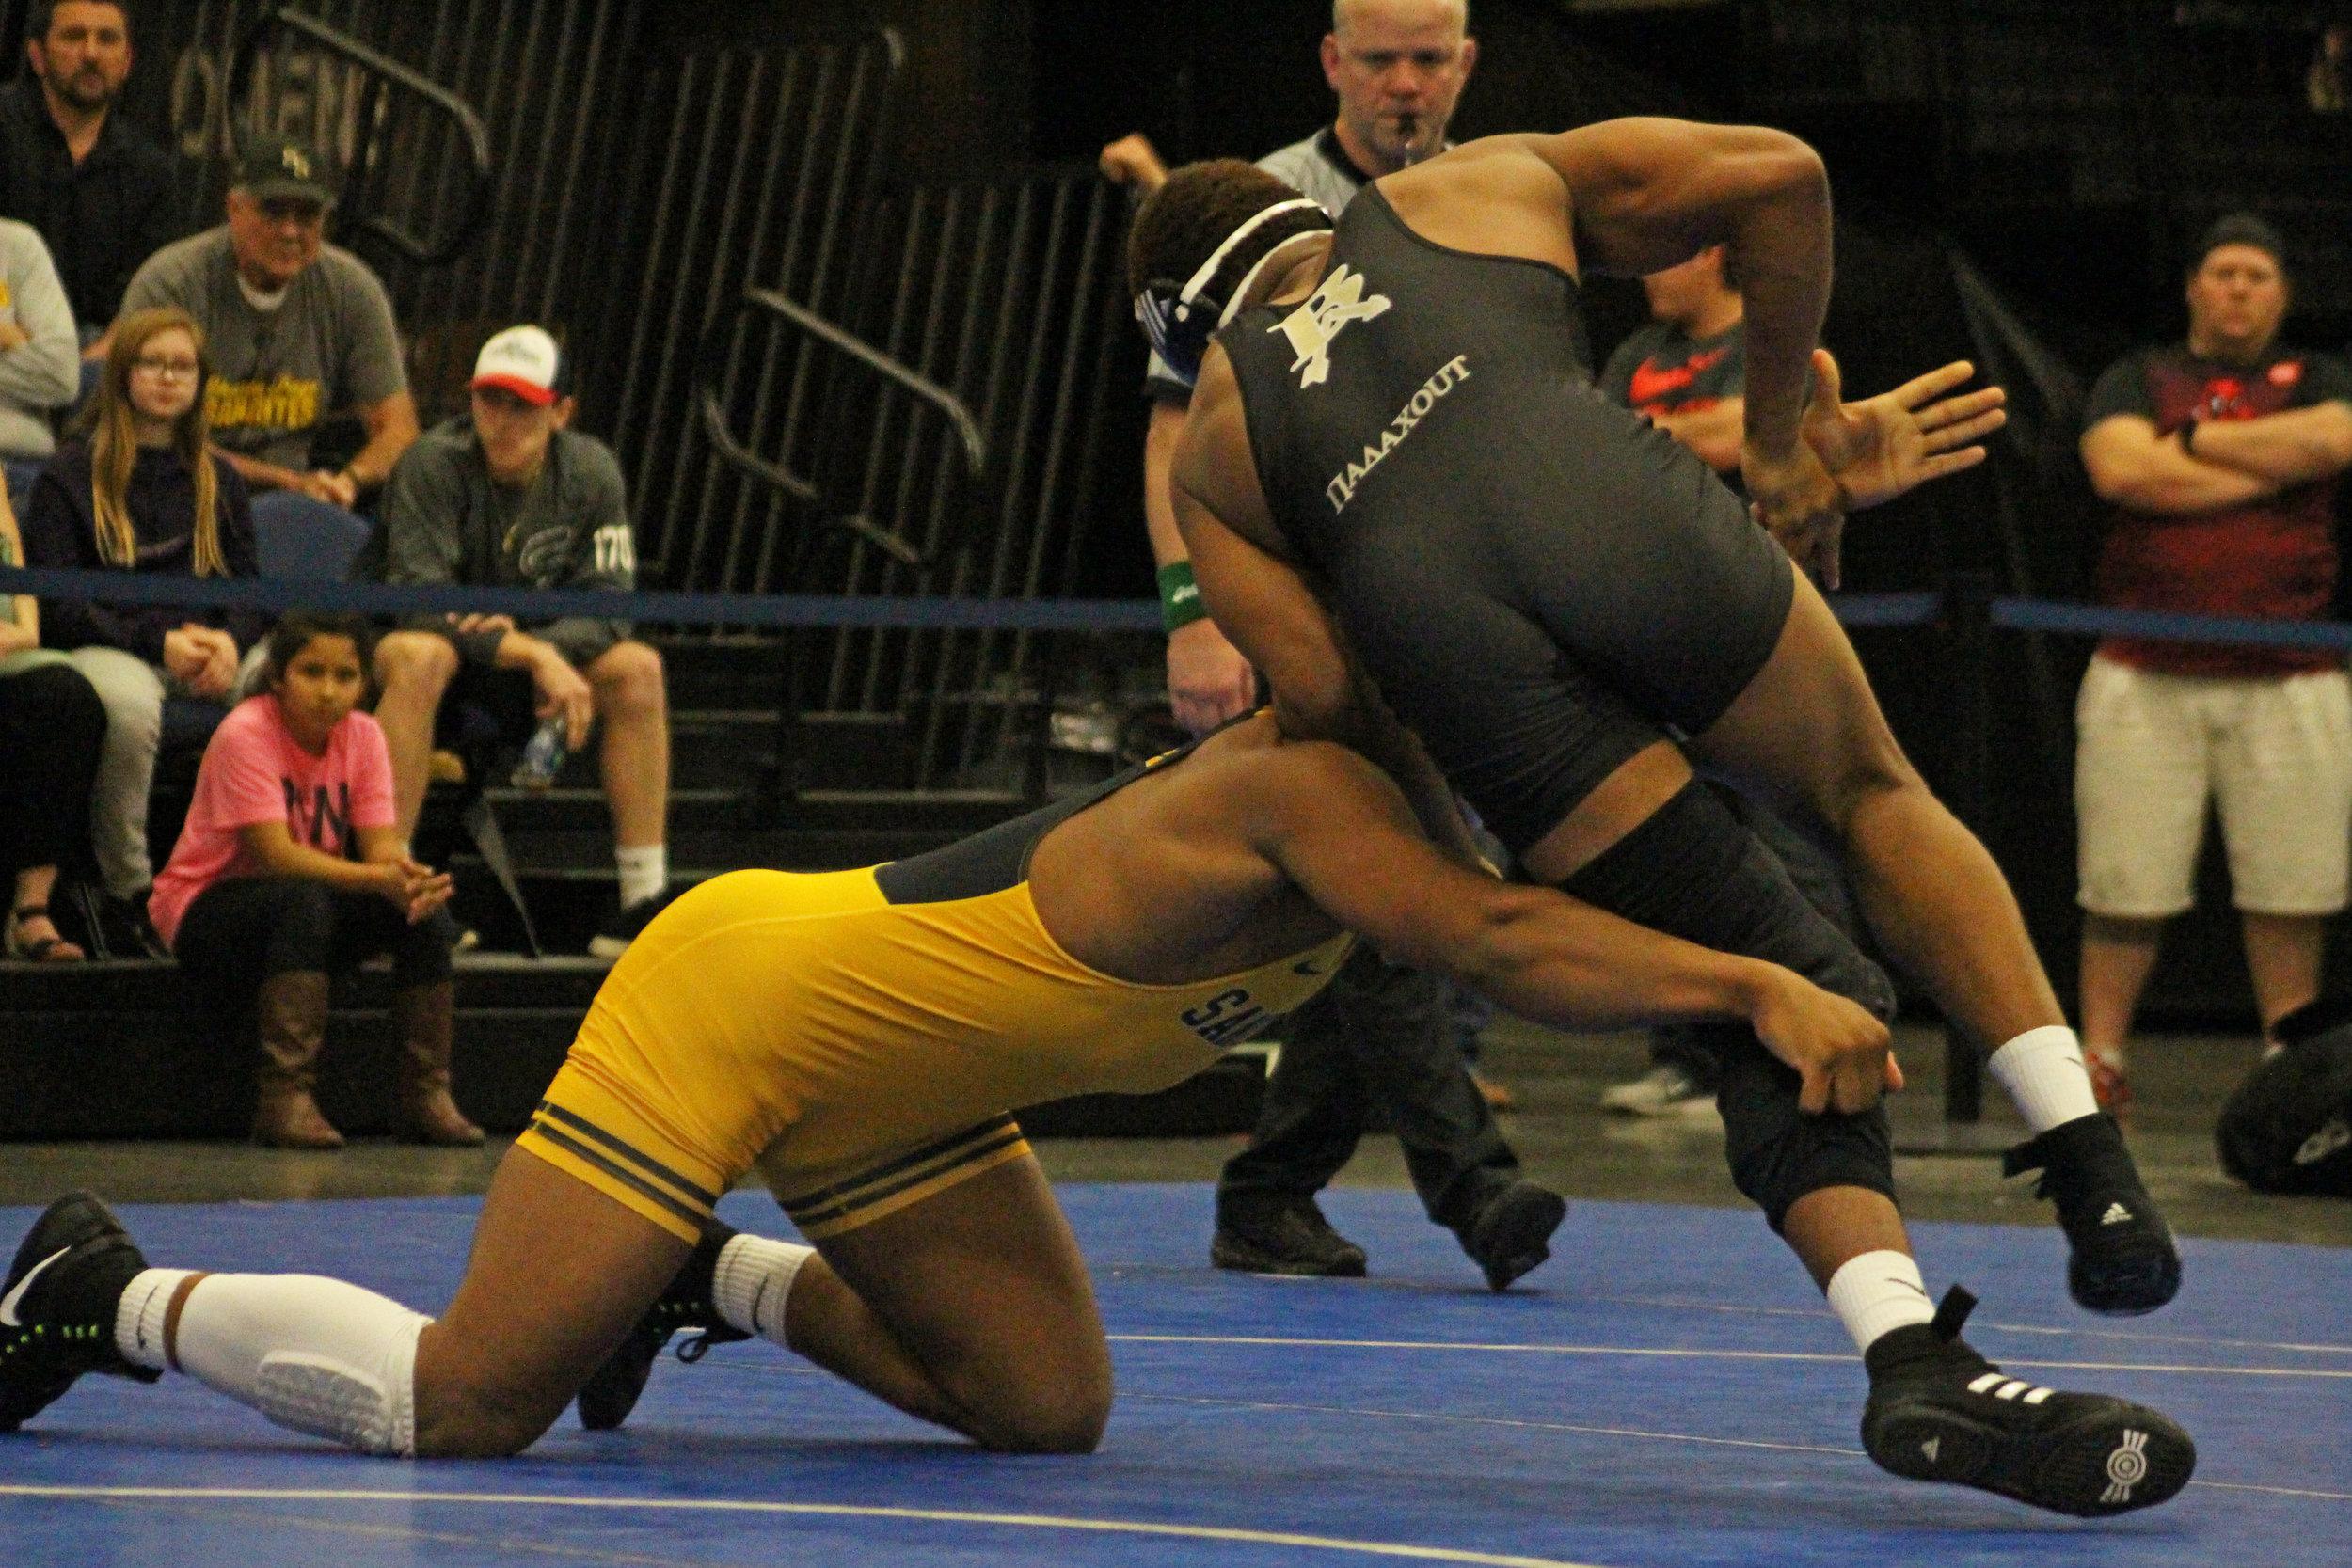 Delvin Jordan defeated defending State Champion Skyler Haynes 4-3 in the Dual State Finals.